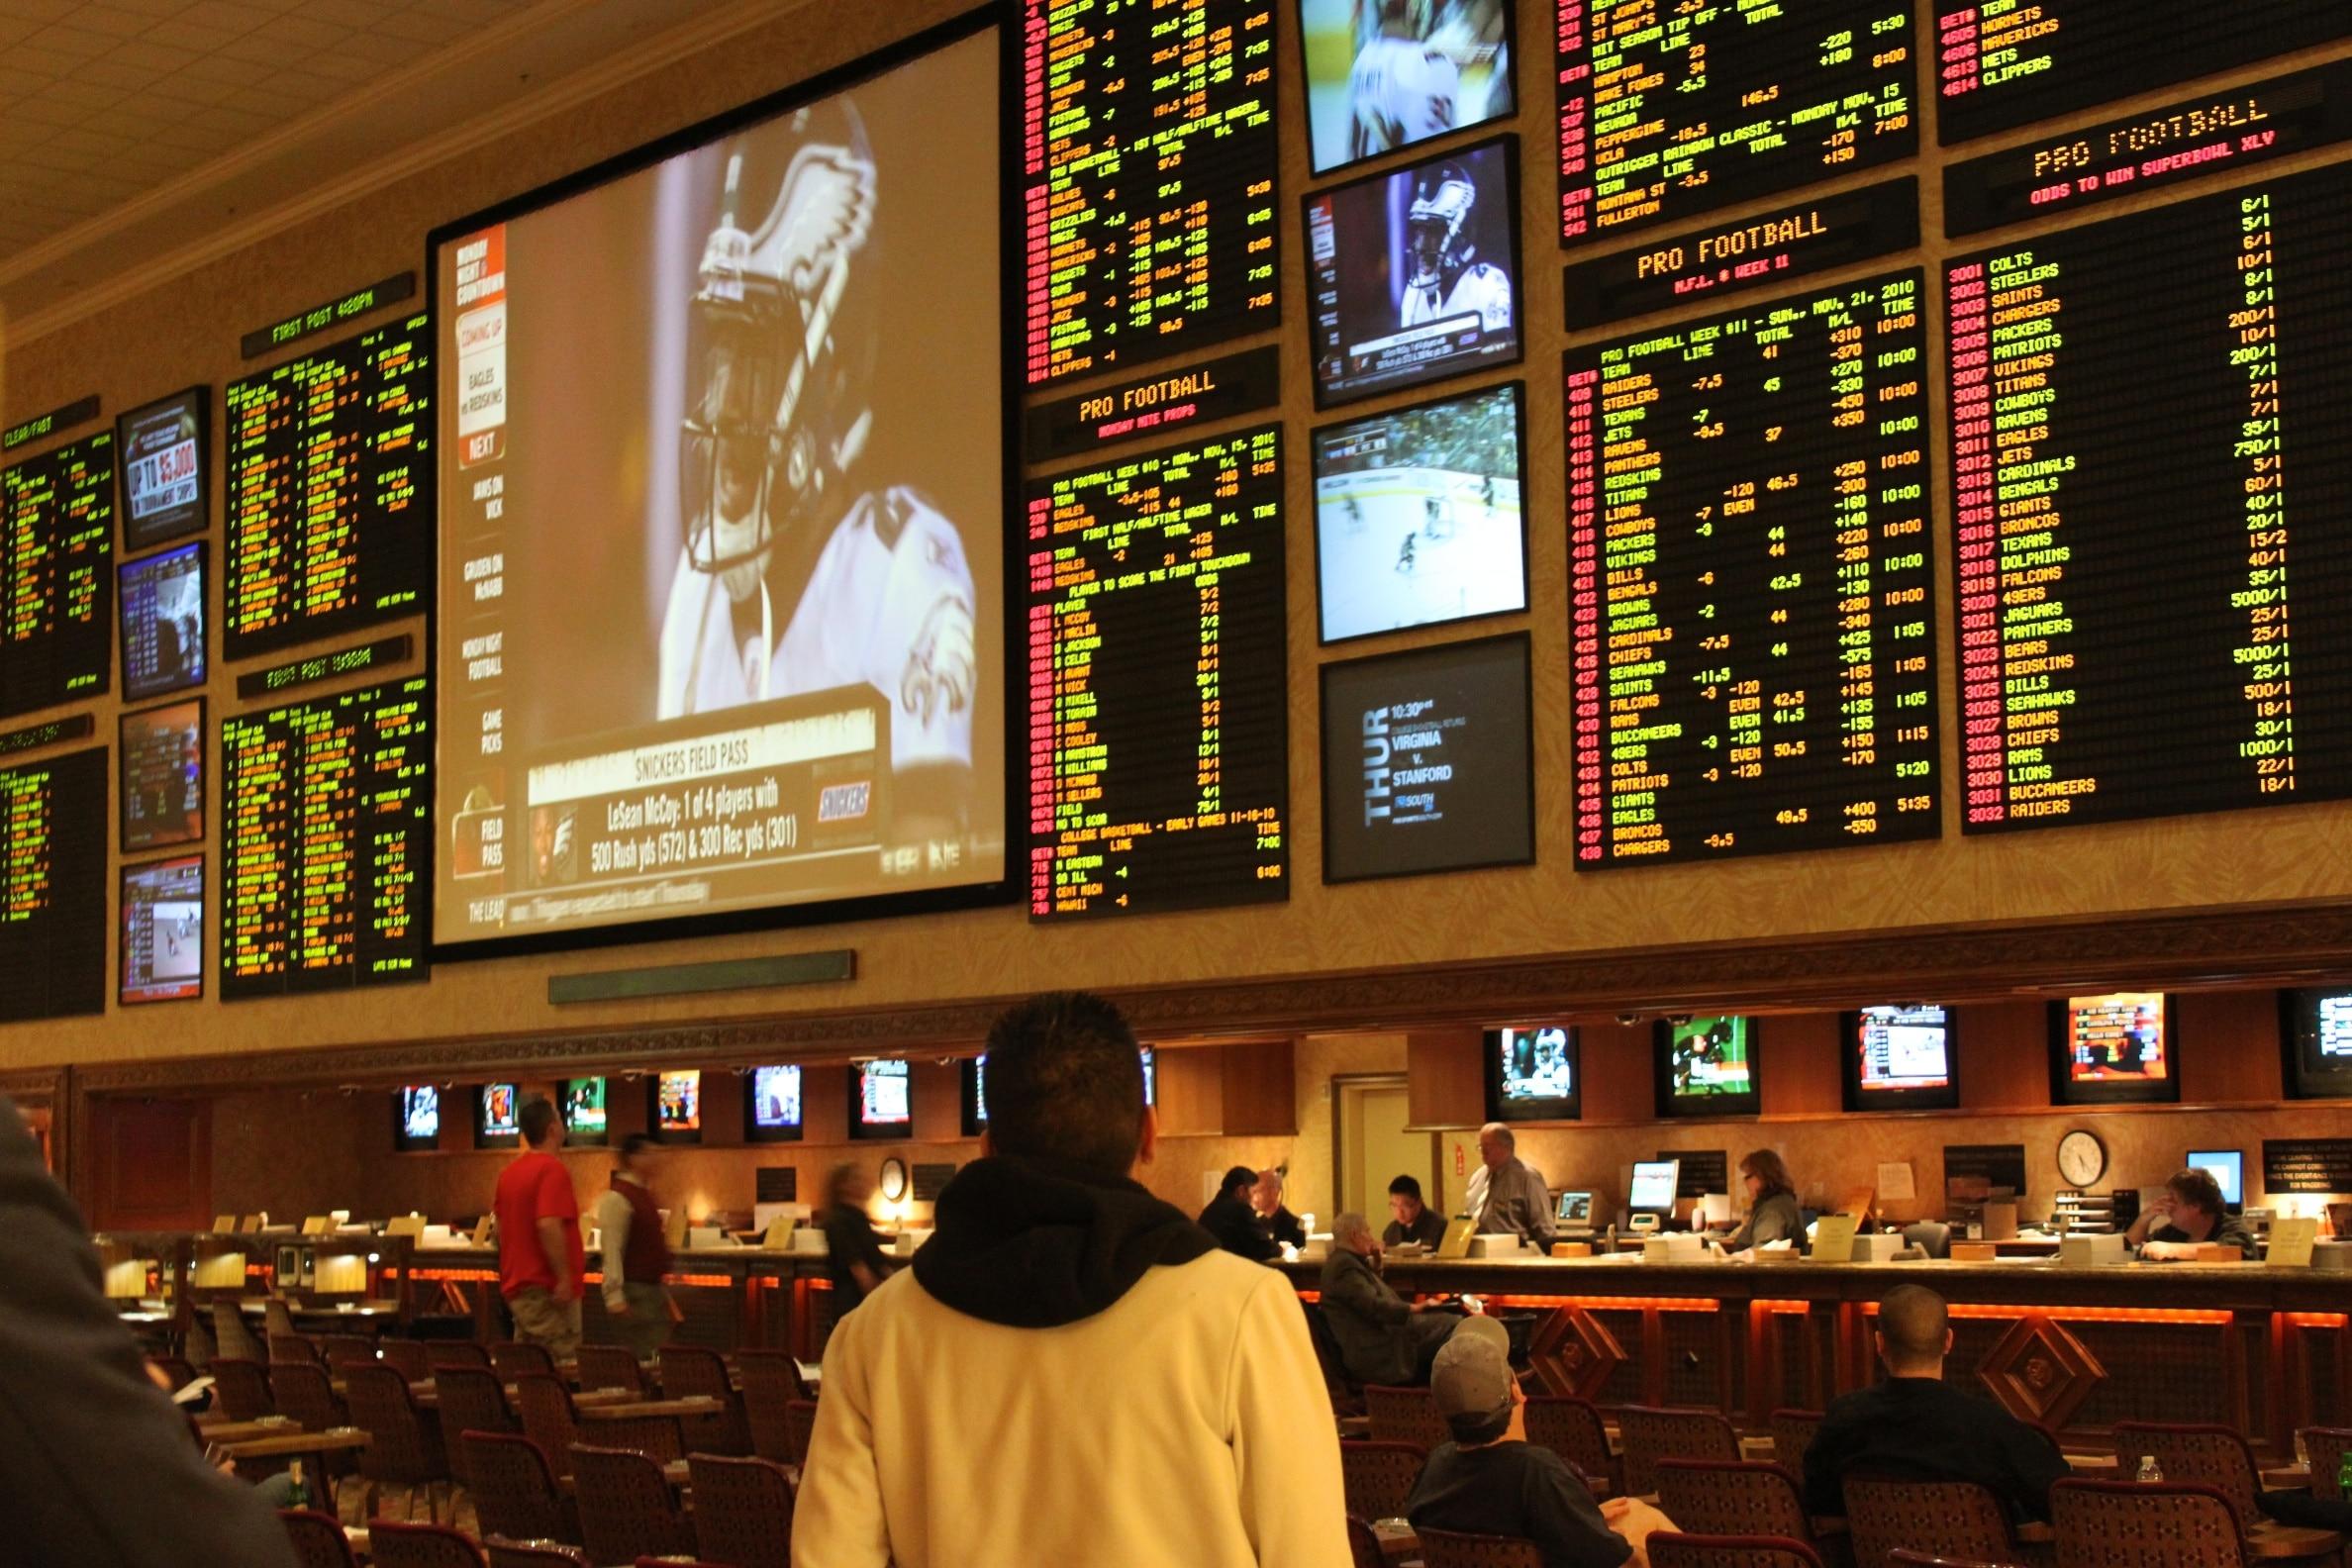 Nj sports betting locations in nj trade binary options uk basketball